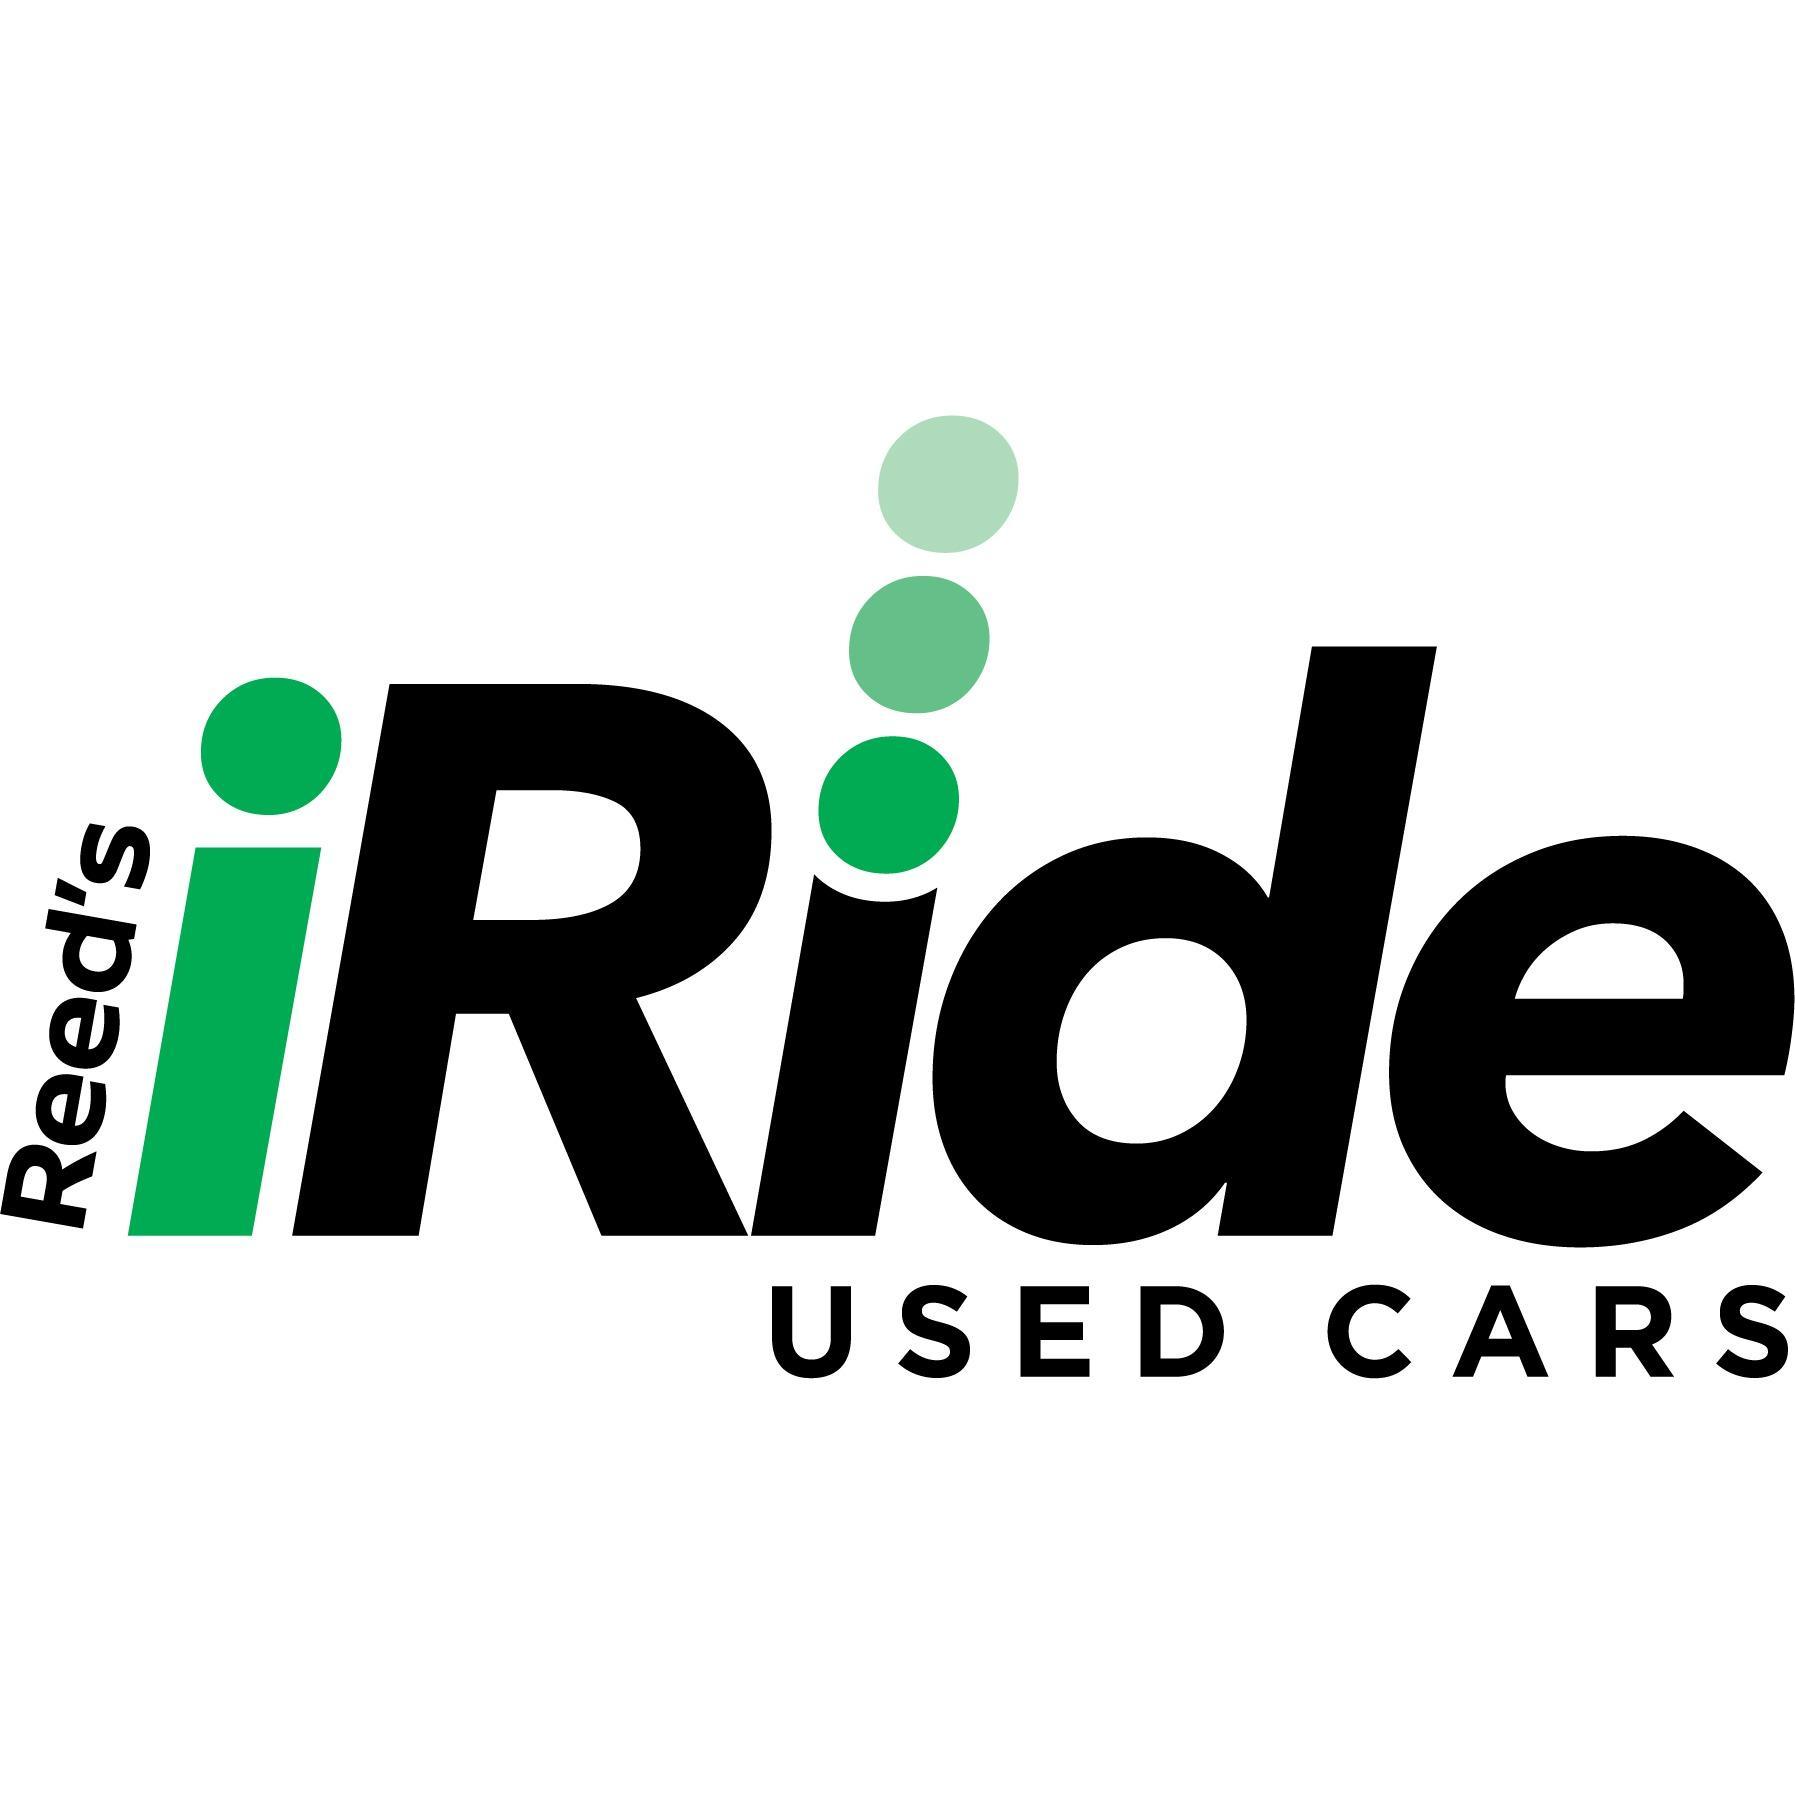 Reed's iRide Used Cars